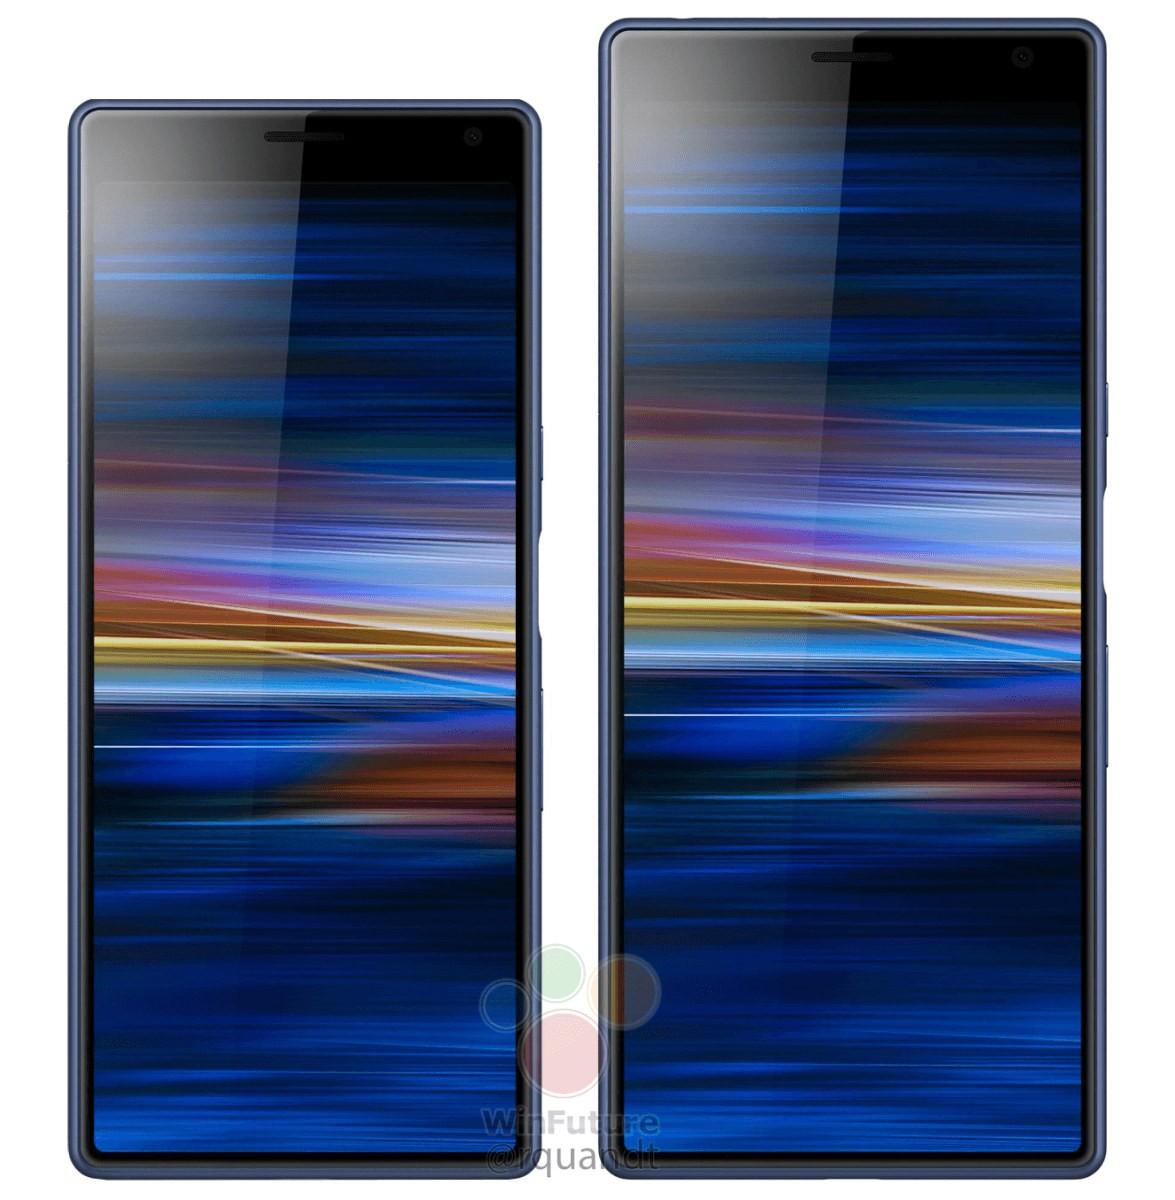 Sony Xperia XA3 and XA3 Ultra Appear in New Renders